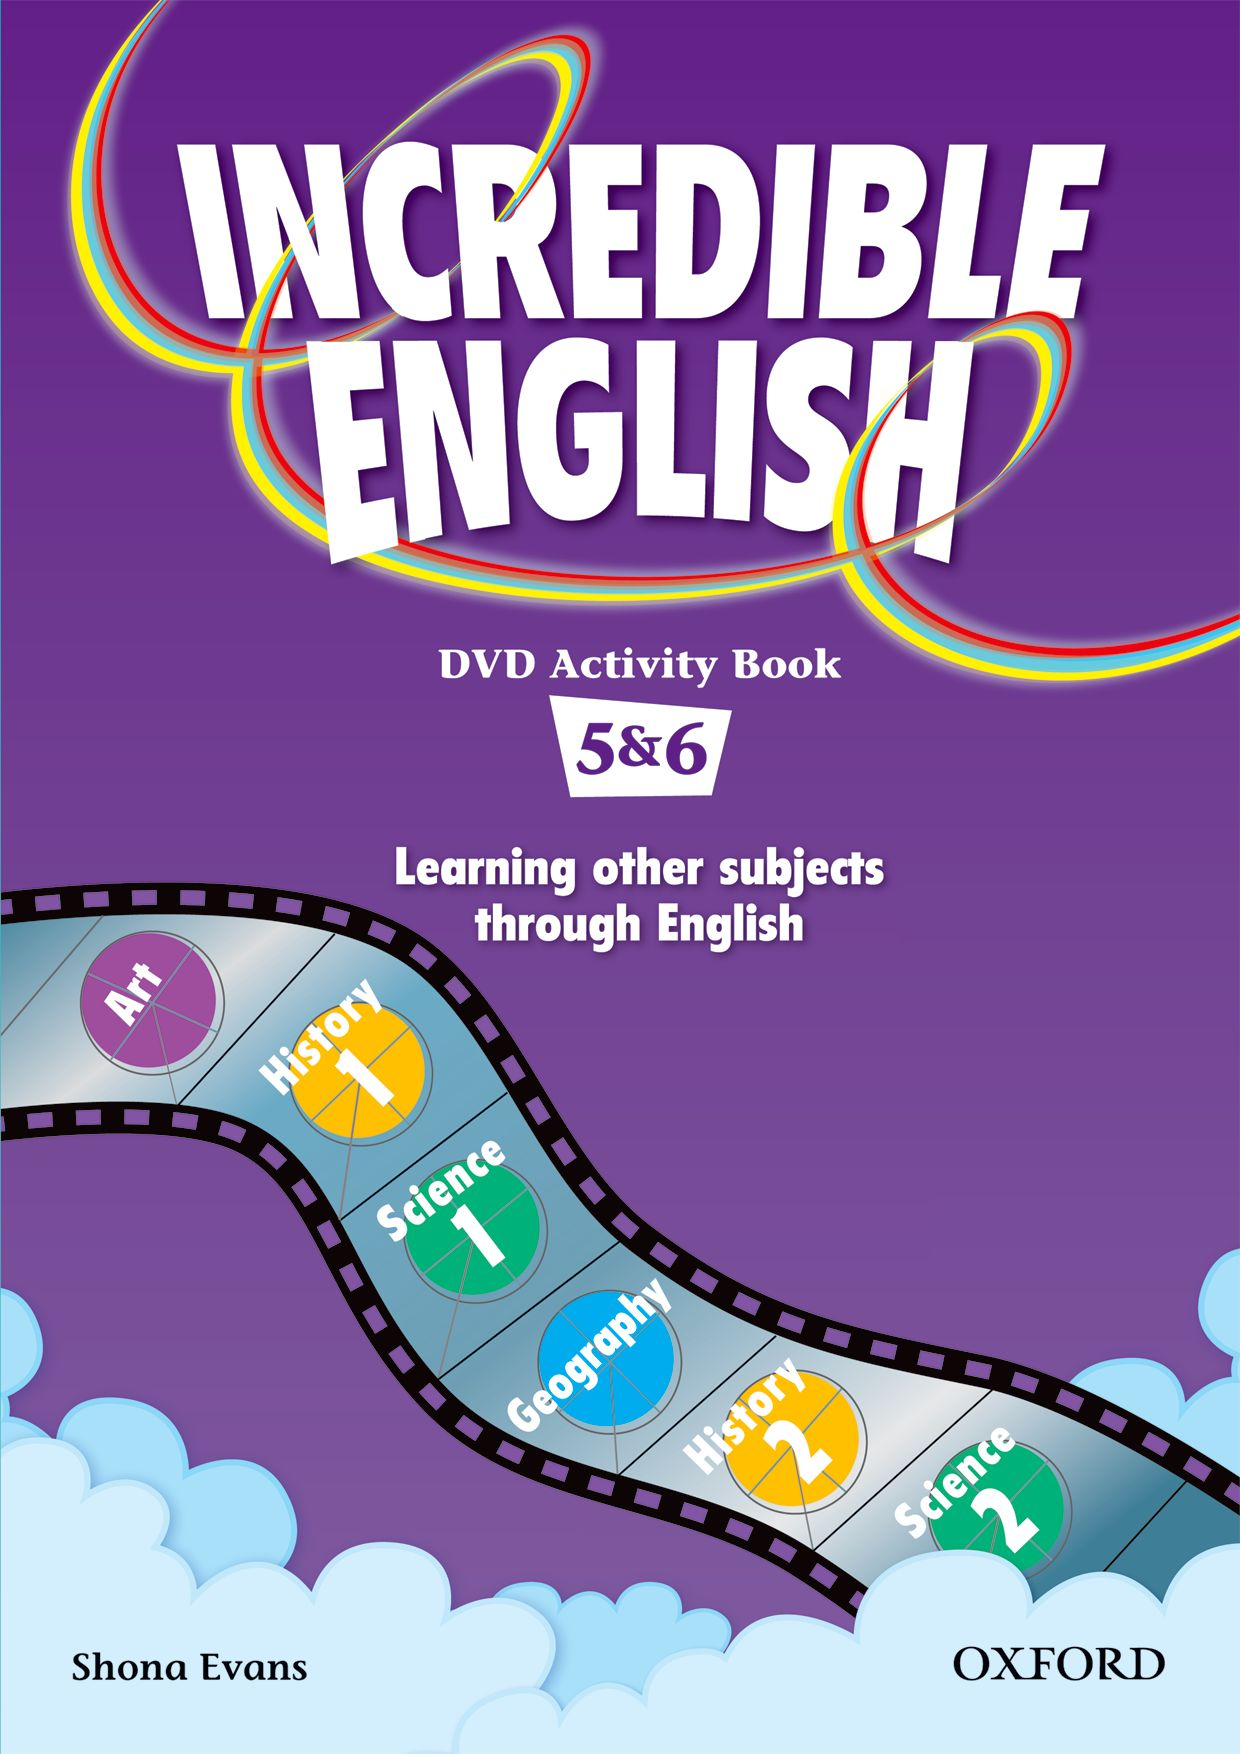 INCREDIBLE ENGLISHLISH 5&6 DVD AB энциклопедия таэквон до 5 dvd